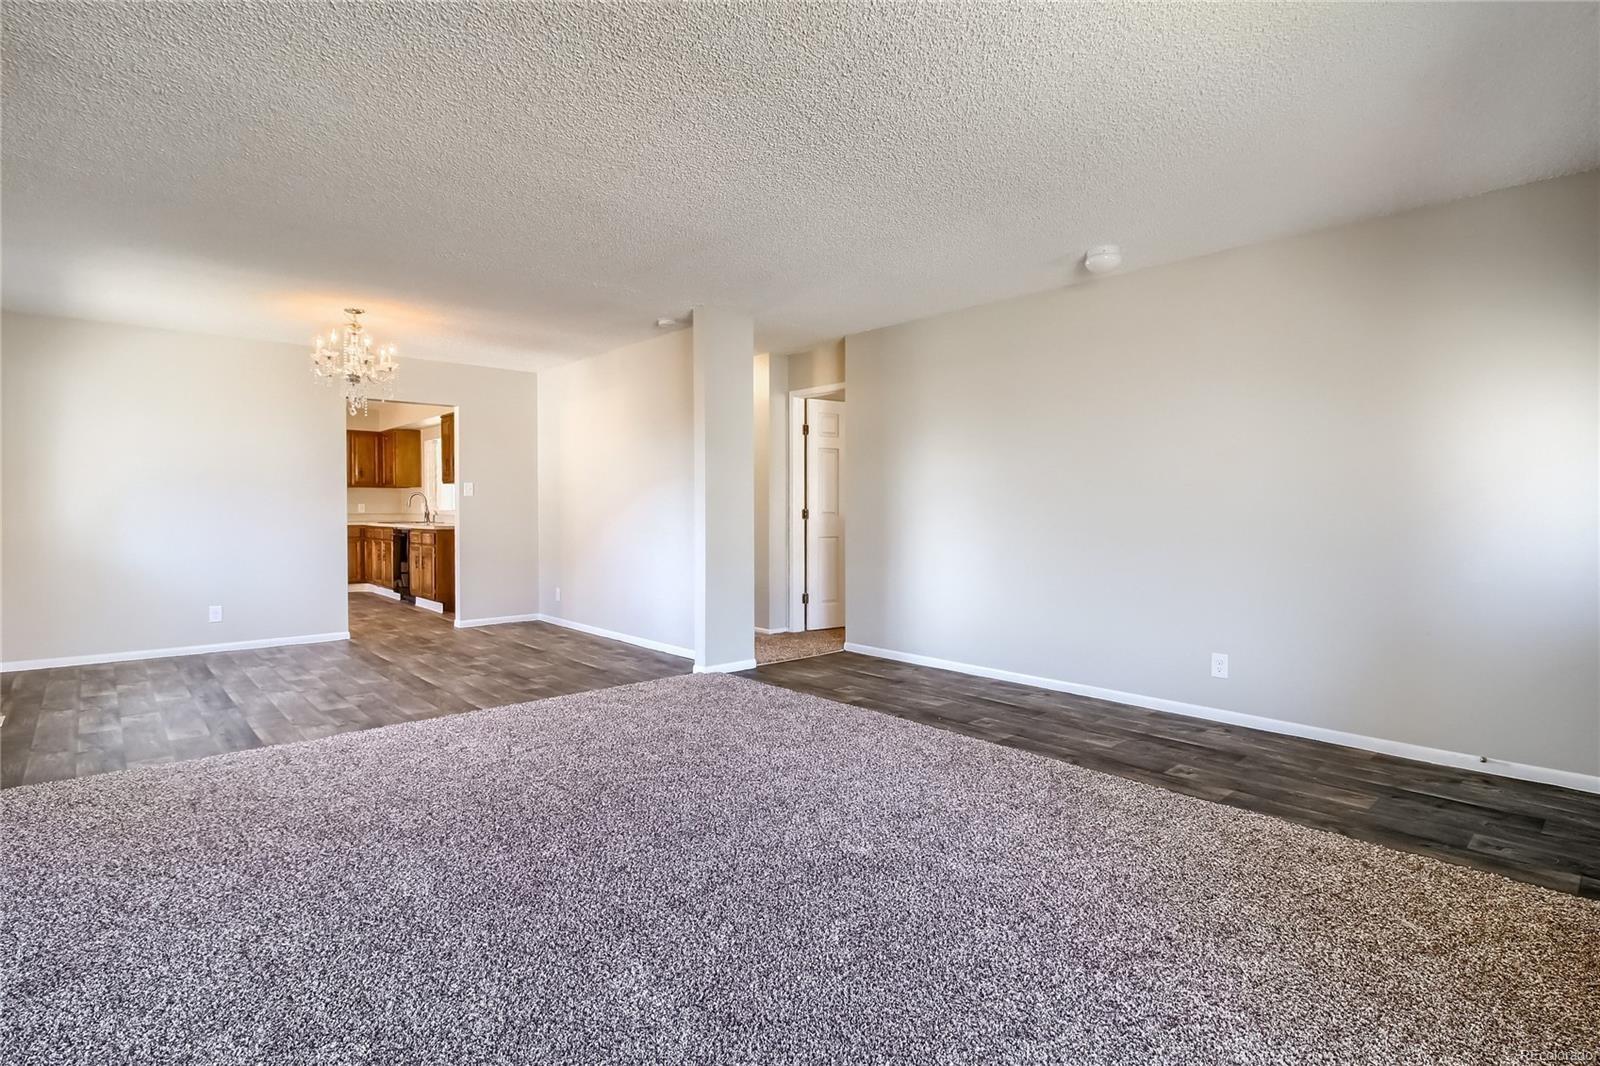 MLS# 4817896 - 5 - 5080 Worchester Street, Denver, CO 80239